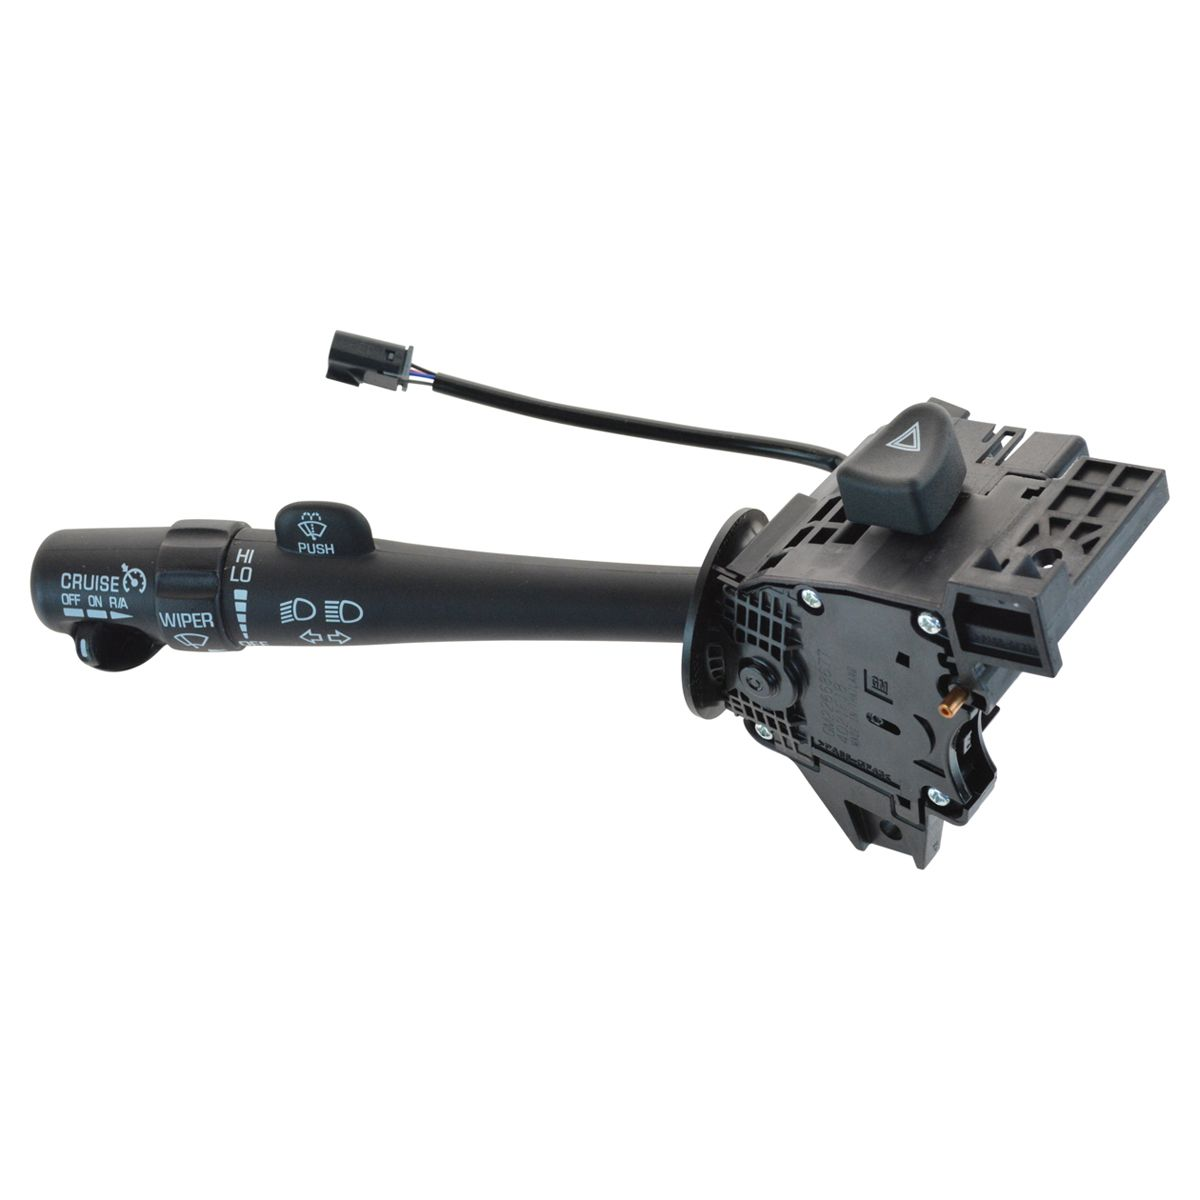 Pontiac Aztek Buick Rendezvous Delco Headlamp Turn Signal Wiper Switch 22668677